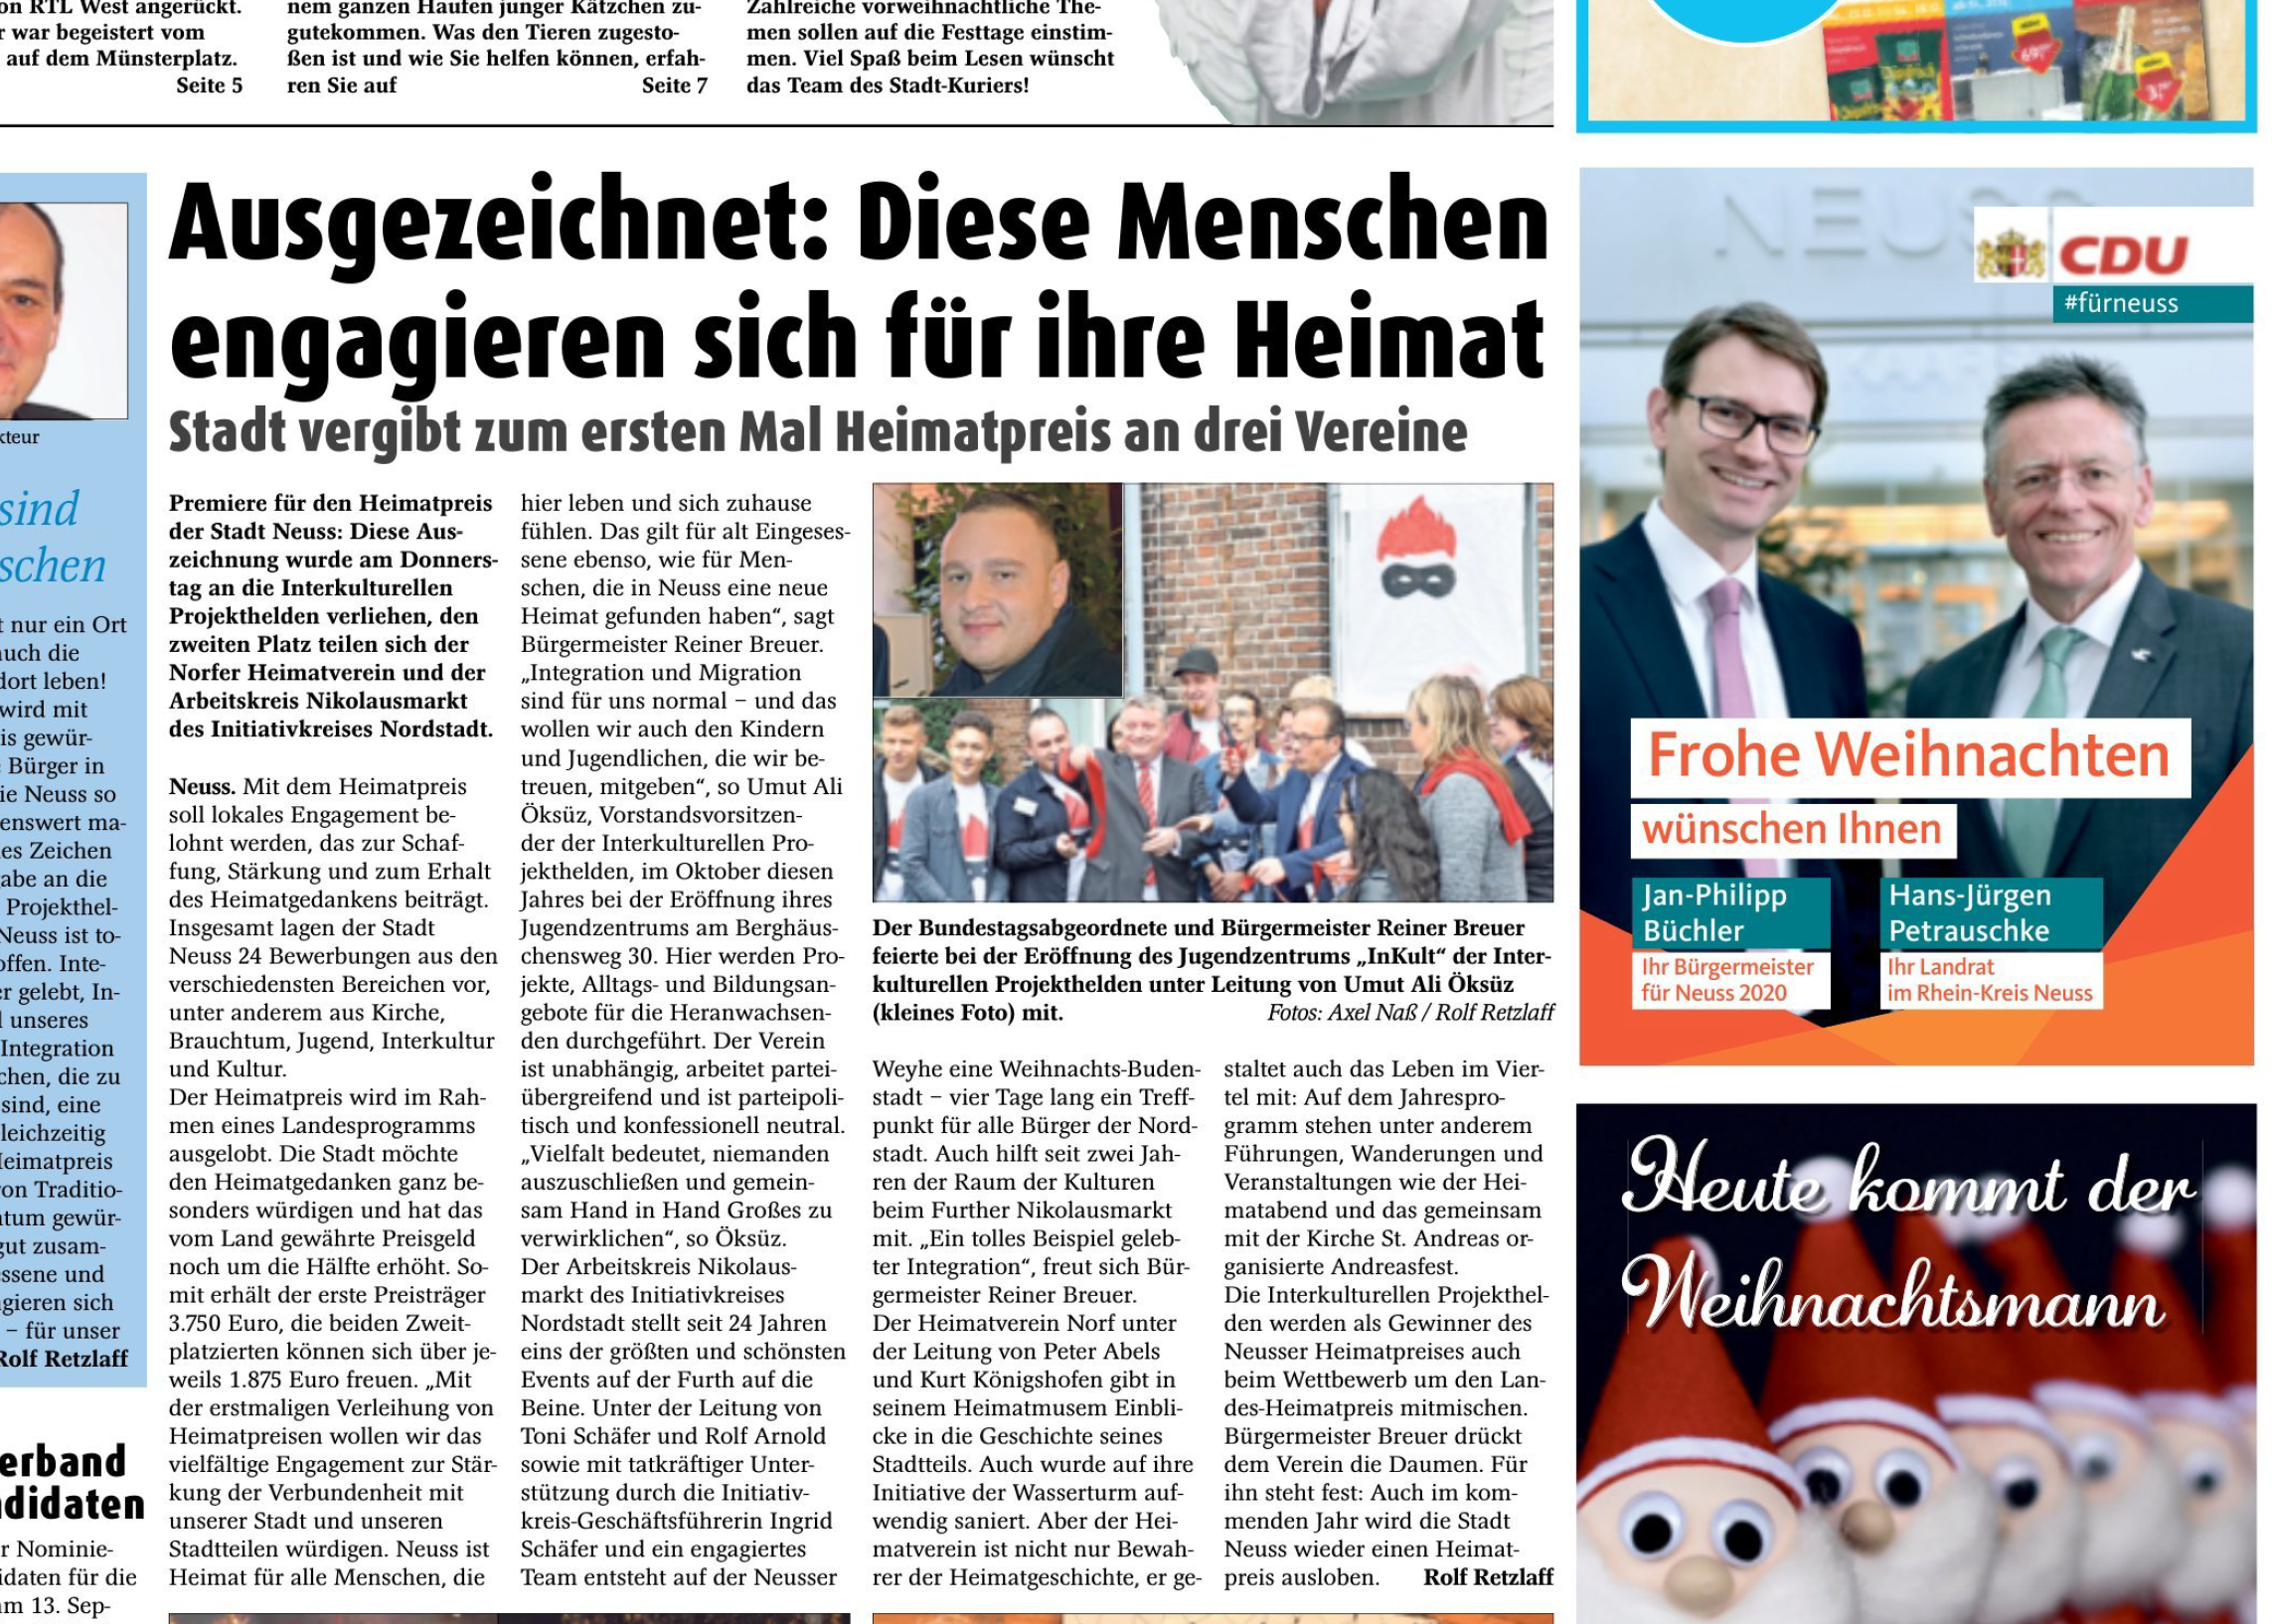 Heimatpreis NRW Interkulturelle Projekthelden